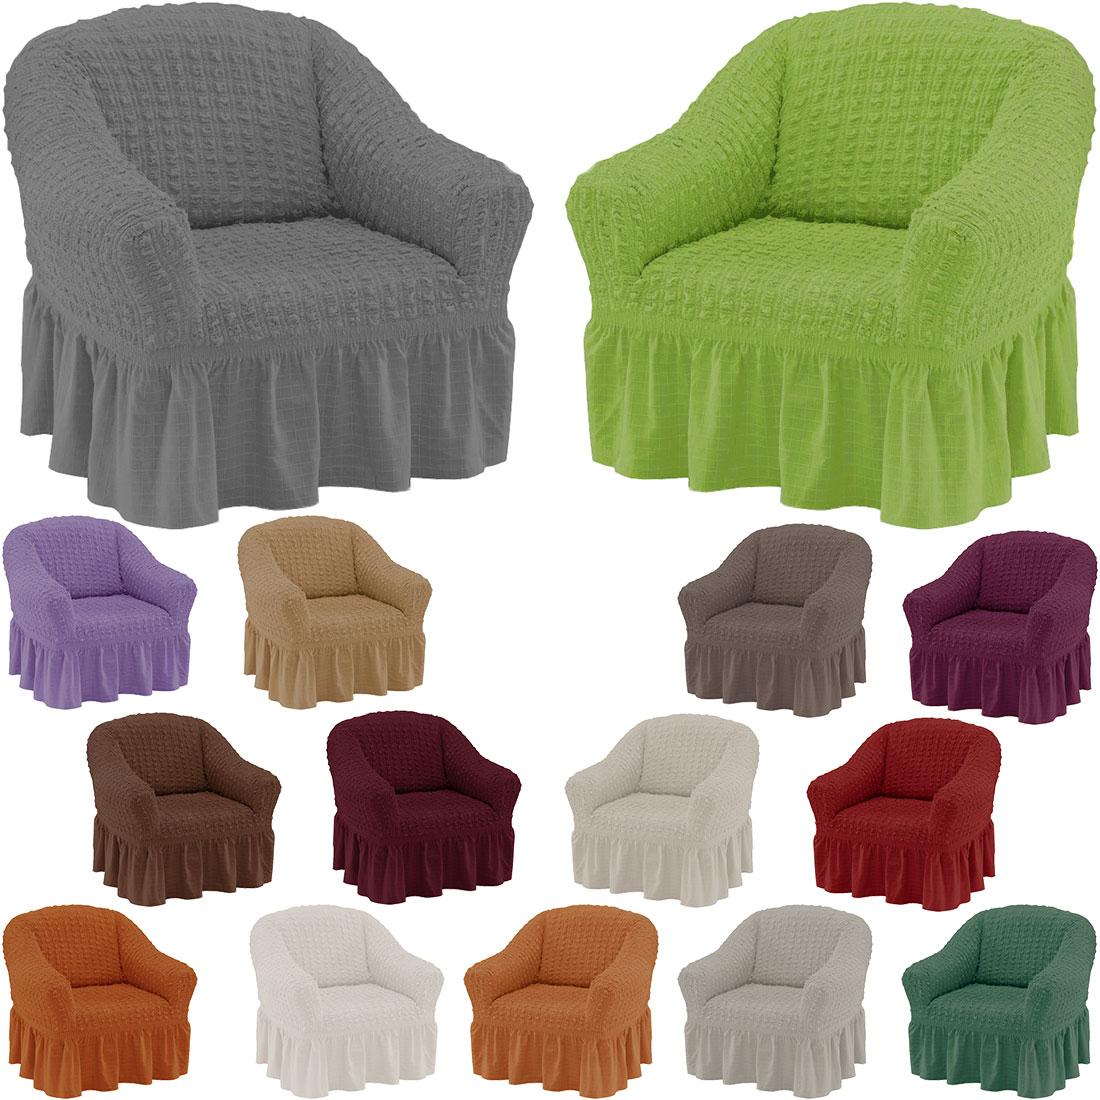 qool24 sofahusse hoch sesselbezug braun sessel husse bezug. Black Bedroom Furniture Sets. Home Design Ideas